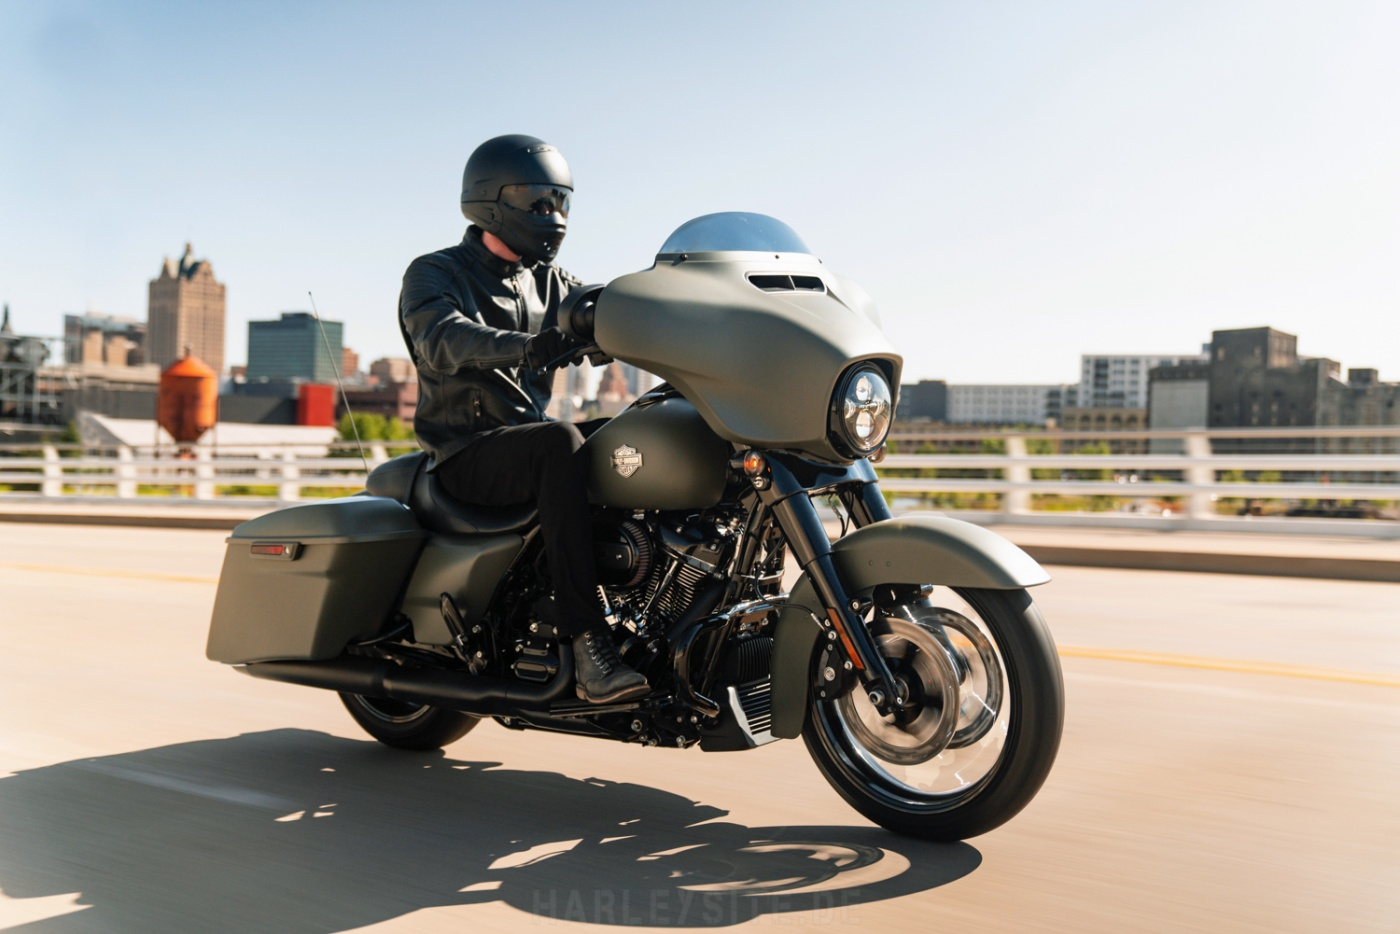 LED Daymaker Scheinwerfer - Harley-Davidson Street Glide Special 2021